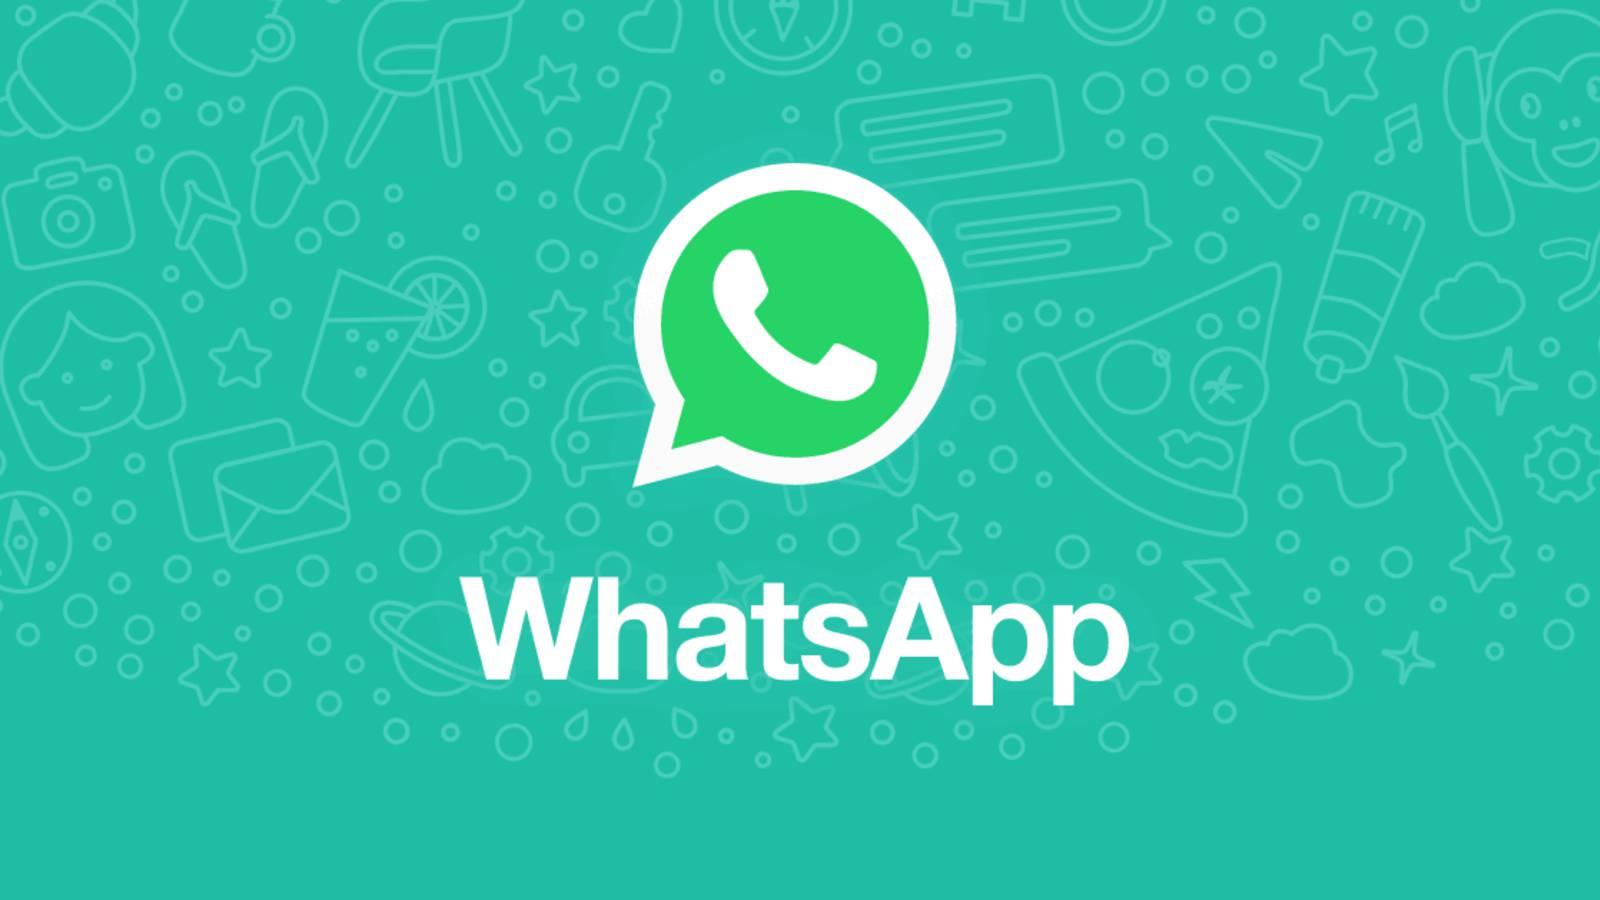 WhatsApp protest